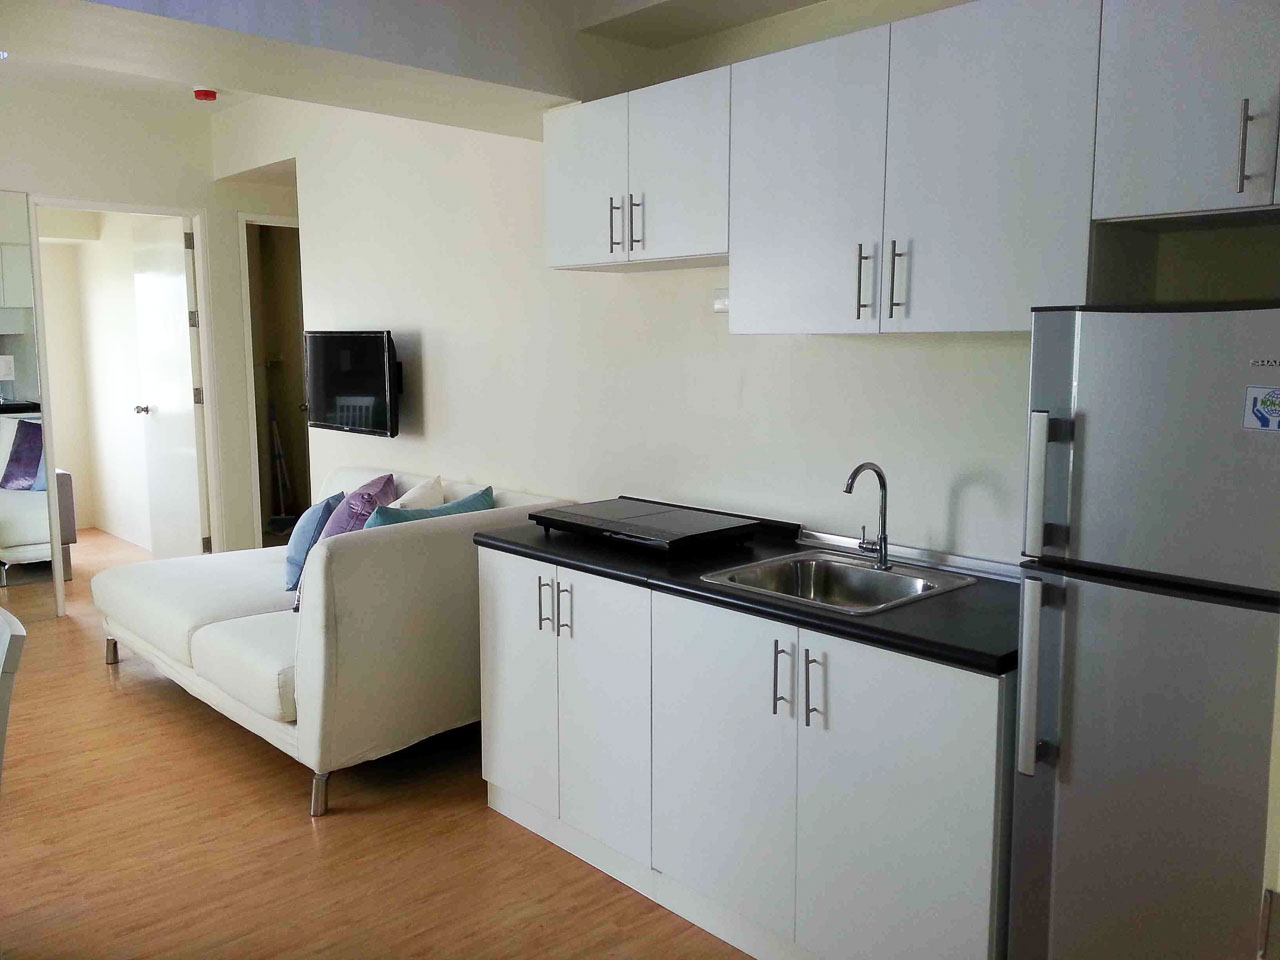 new 2 bedroom condo for rent in cebu it park avida tower 2 cebu grand realty. Black Bedroom Furniture Sets. Home Design Ideas